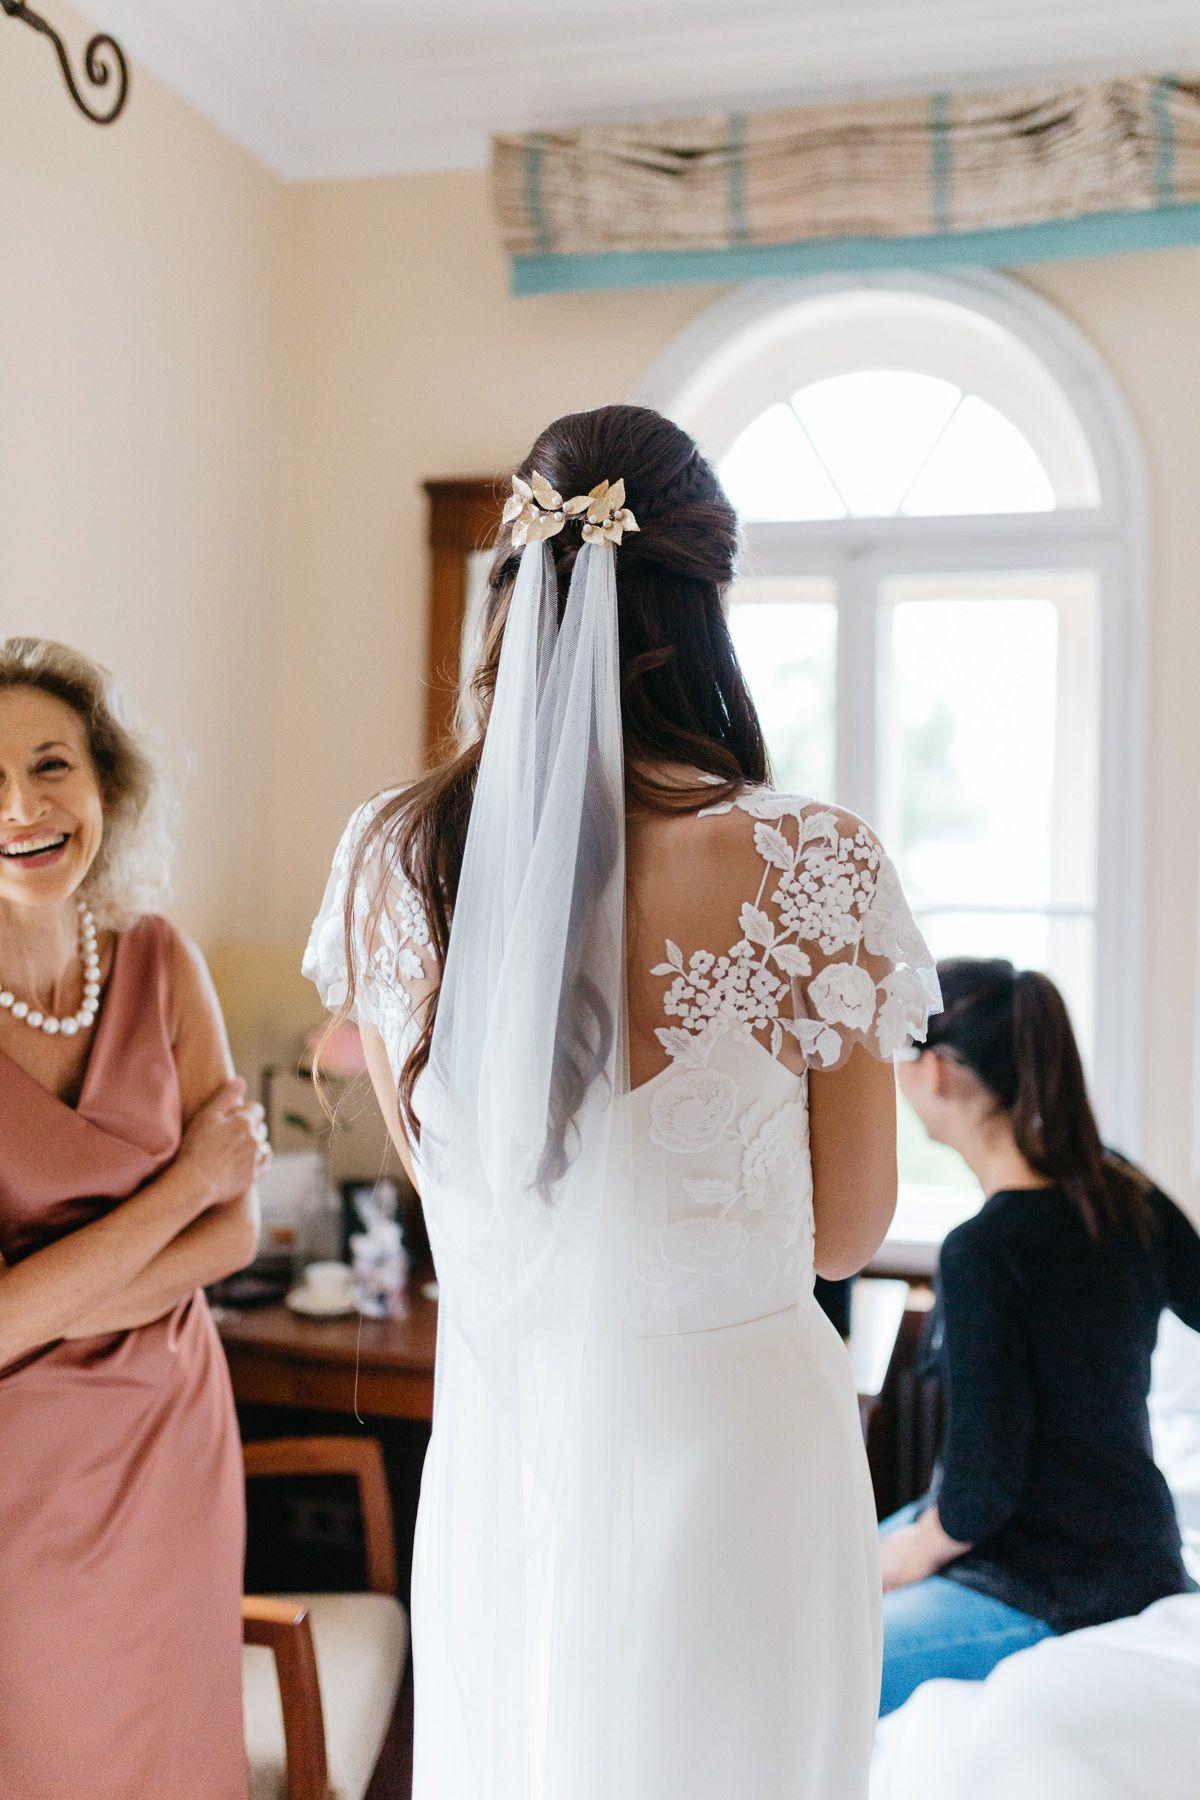 Offene haare diadem braut Braut haarschmuck